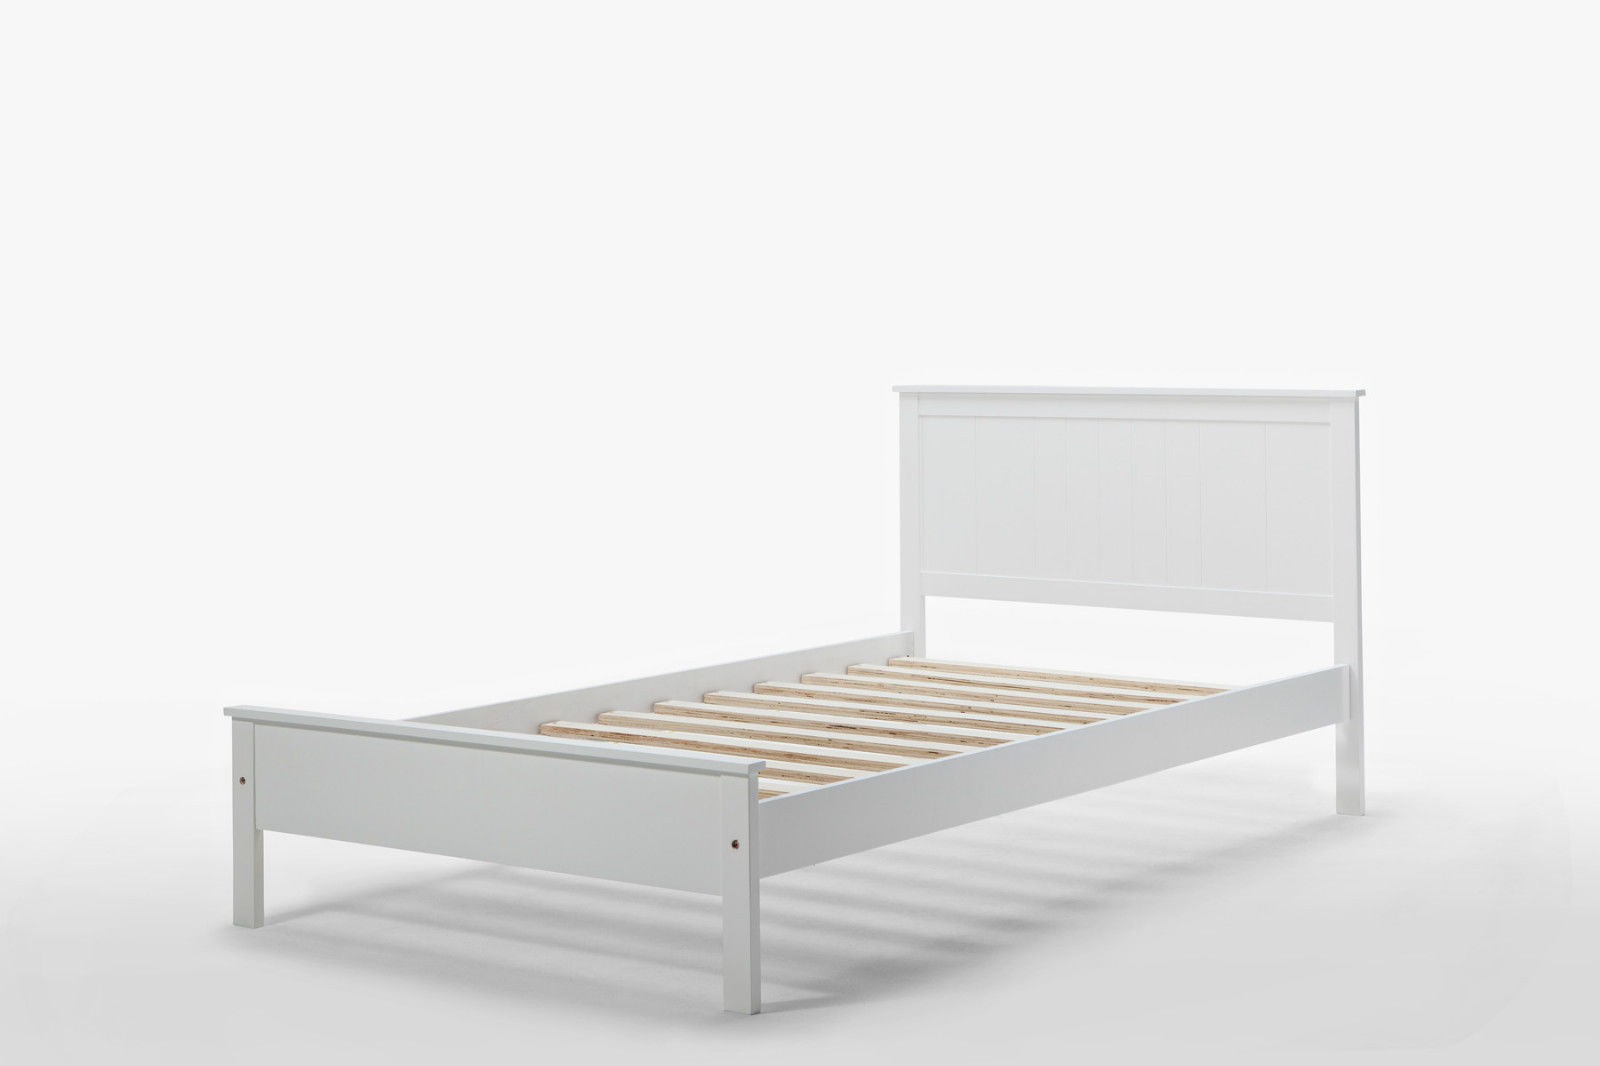 rojo brand new matt white solid rubber wood single bed frame 1 - Simple White Bed Frame